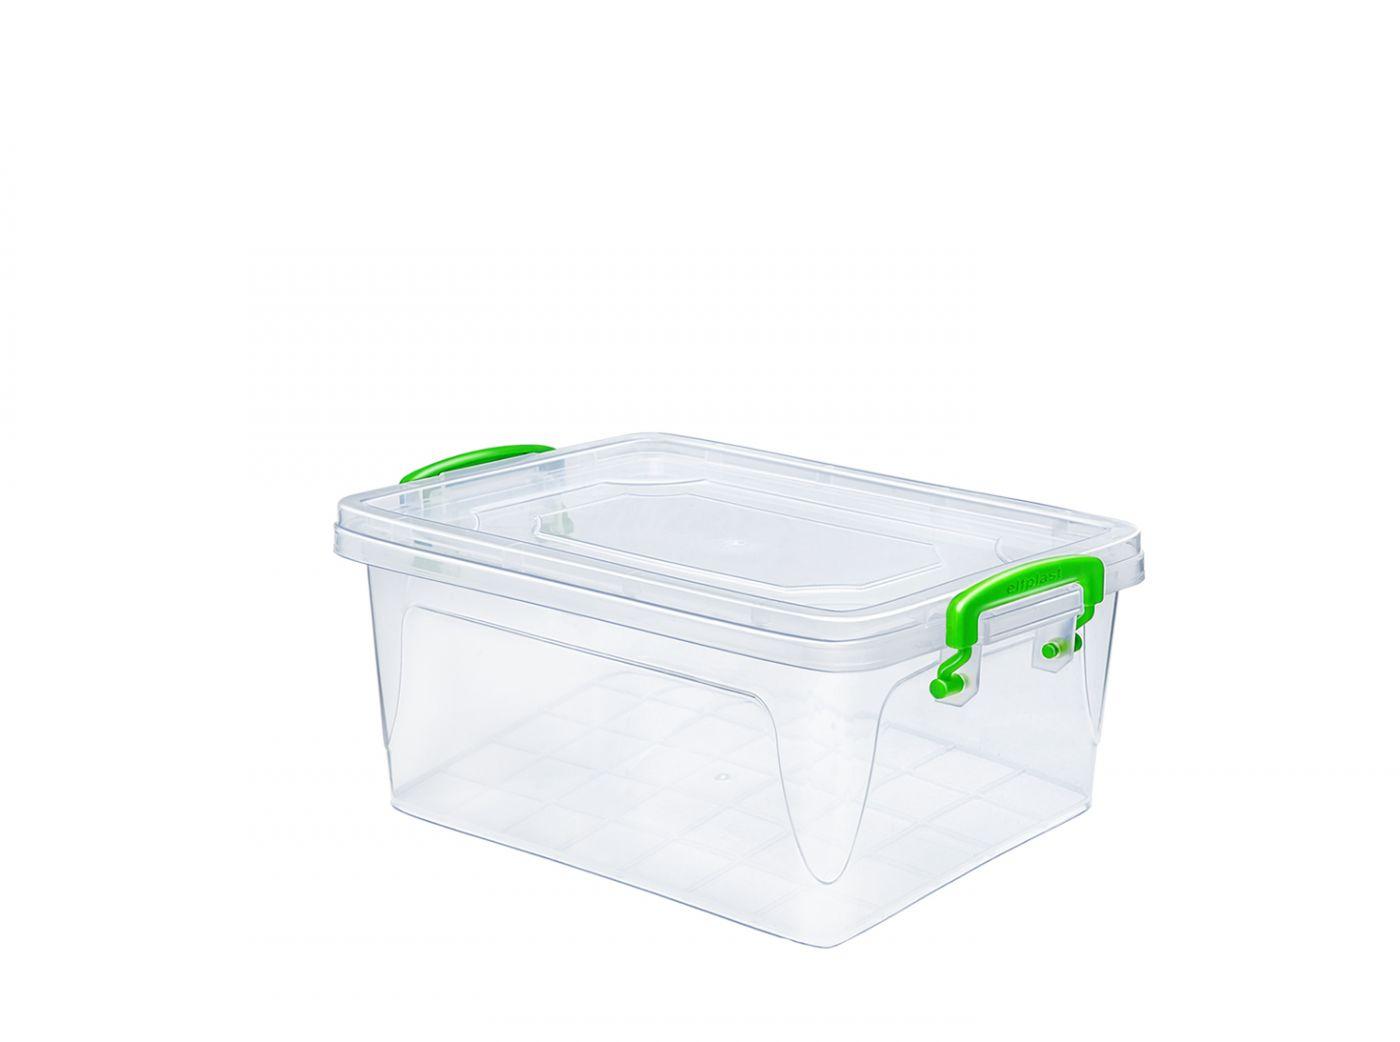 Контейнер для хранения Эльфпласт Fresh Box 1,5 литра с крышкой 21,5х14,5х10 см